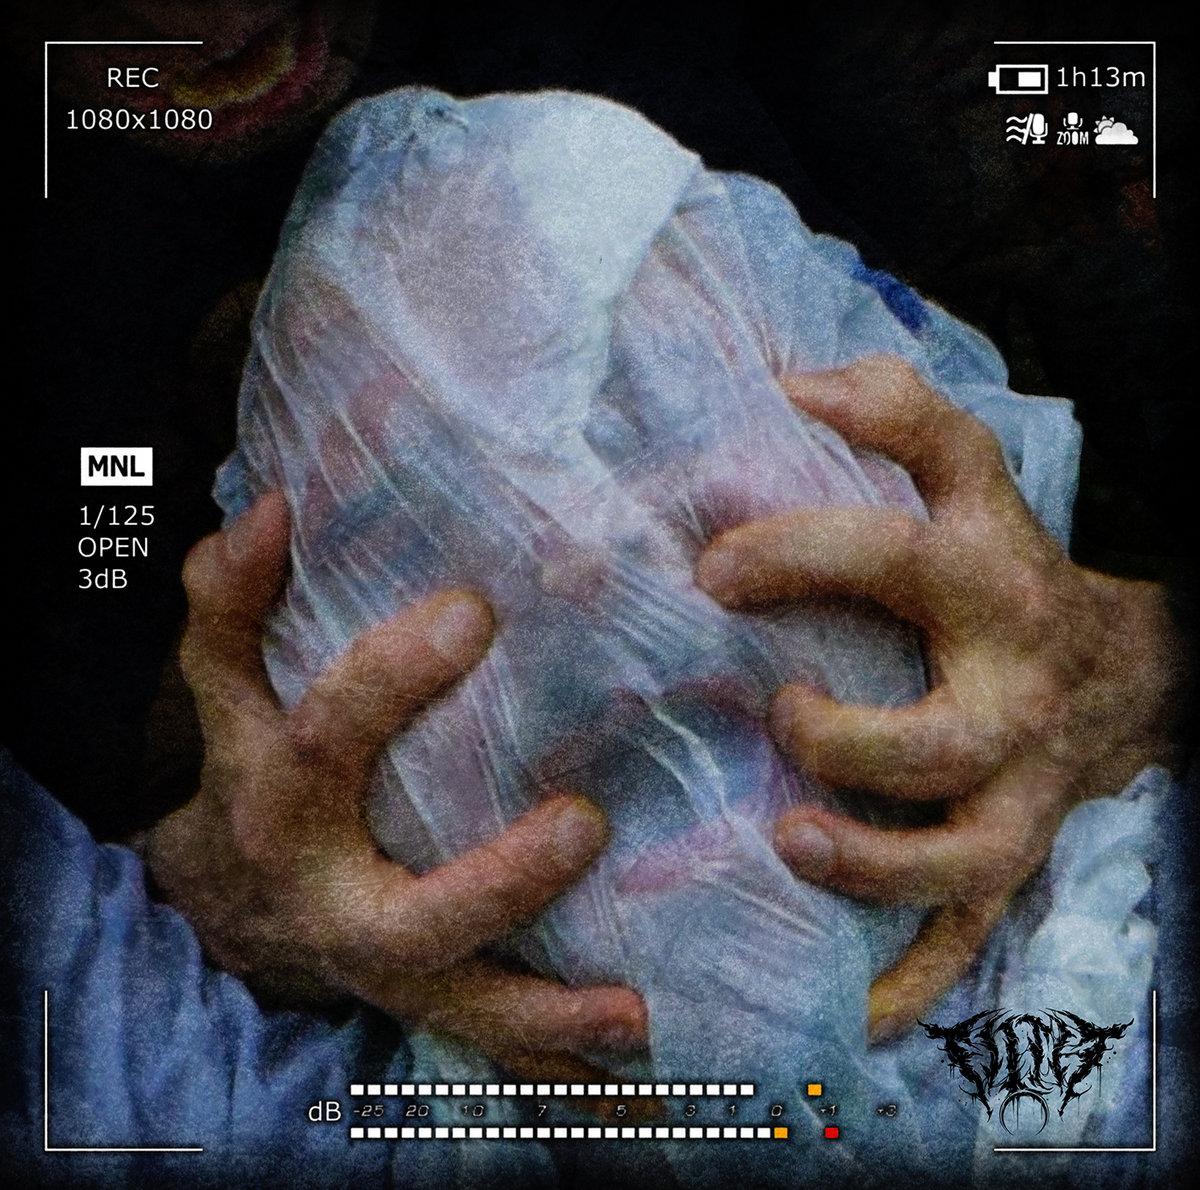 Filth - Filth [EP] (2020)